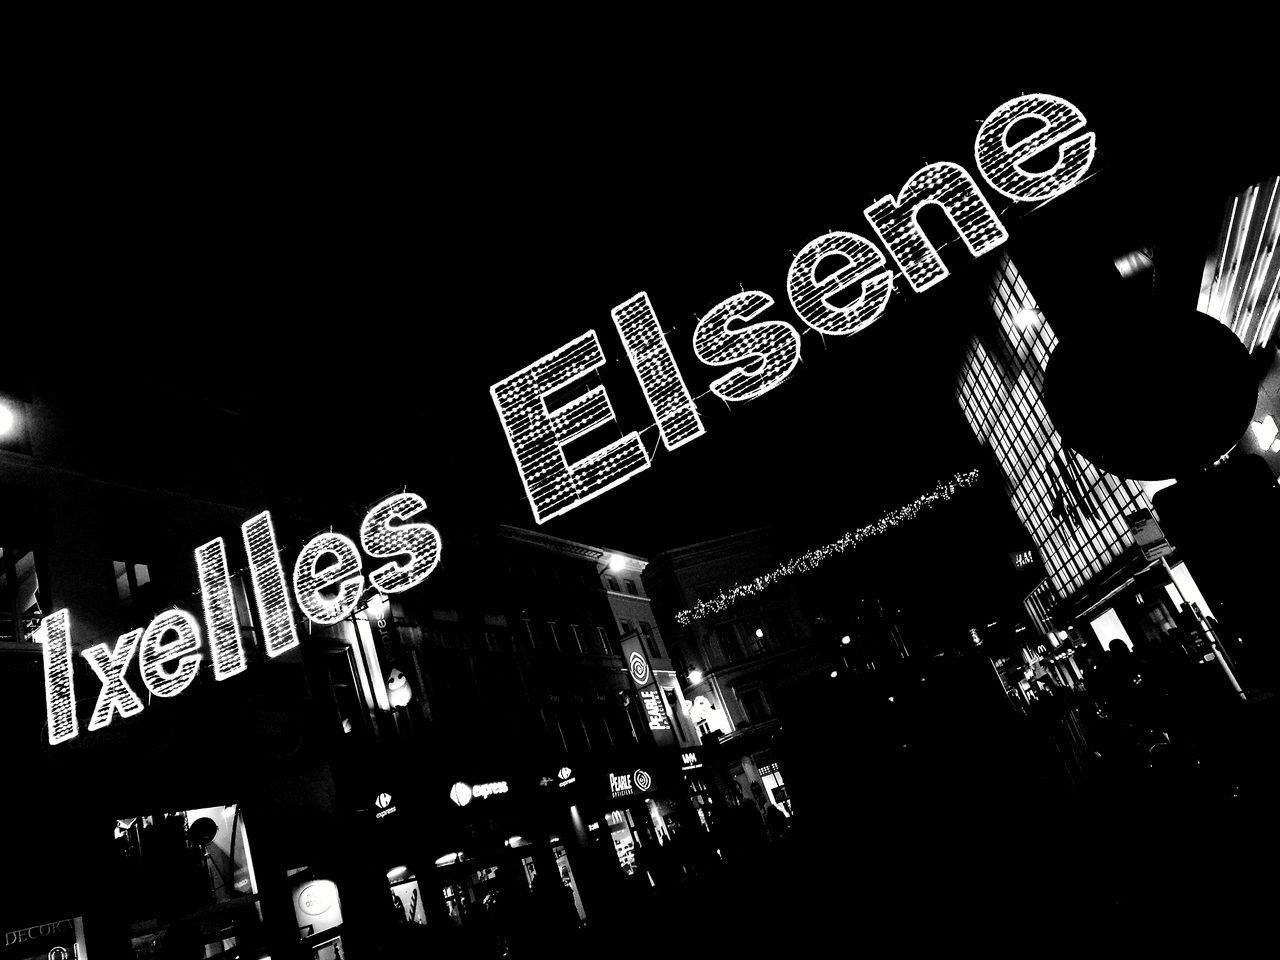 Huaweiphotography Huaweiphotography HuaweiP9 HuaweiP9 Huawei P9 Leica Streetphotography Ixelles Bruxelles ❤ Porte De Namur Black & White Photography Illuminated City Street éclairage Guirlande